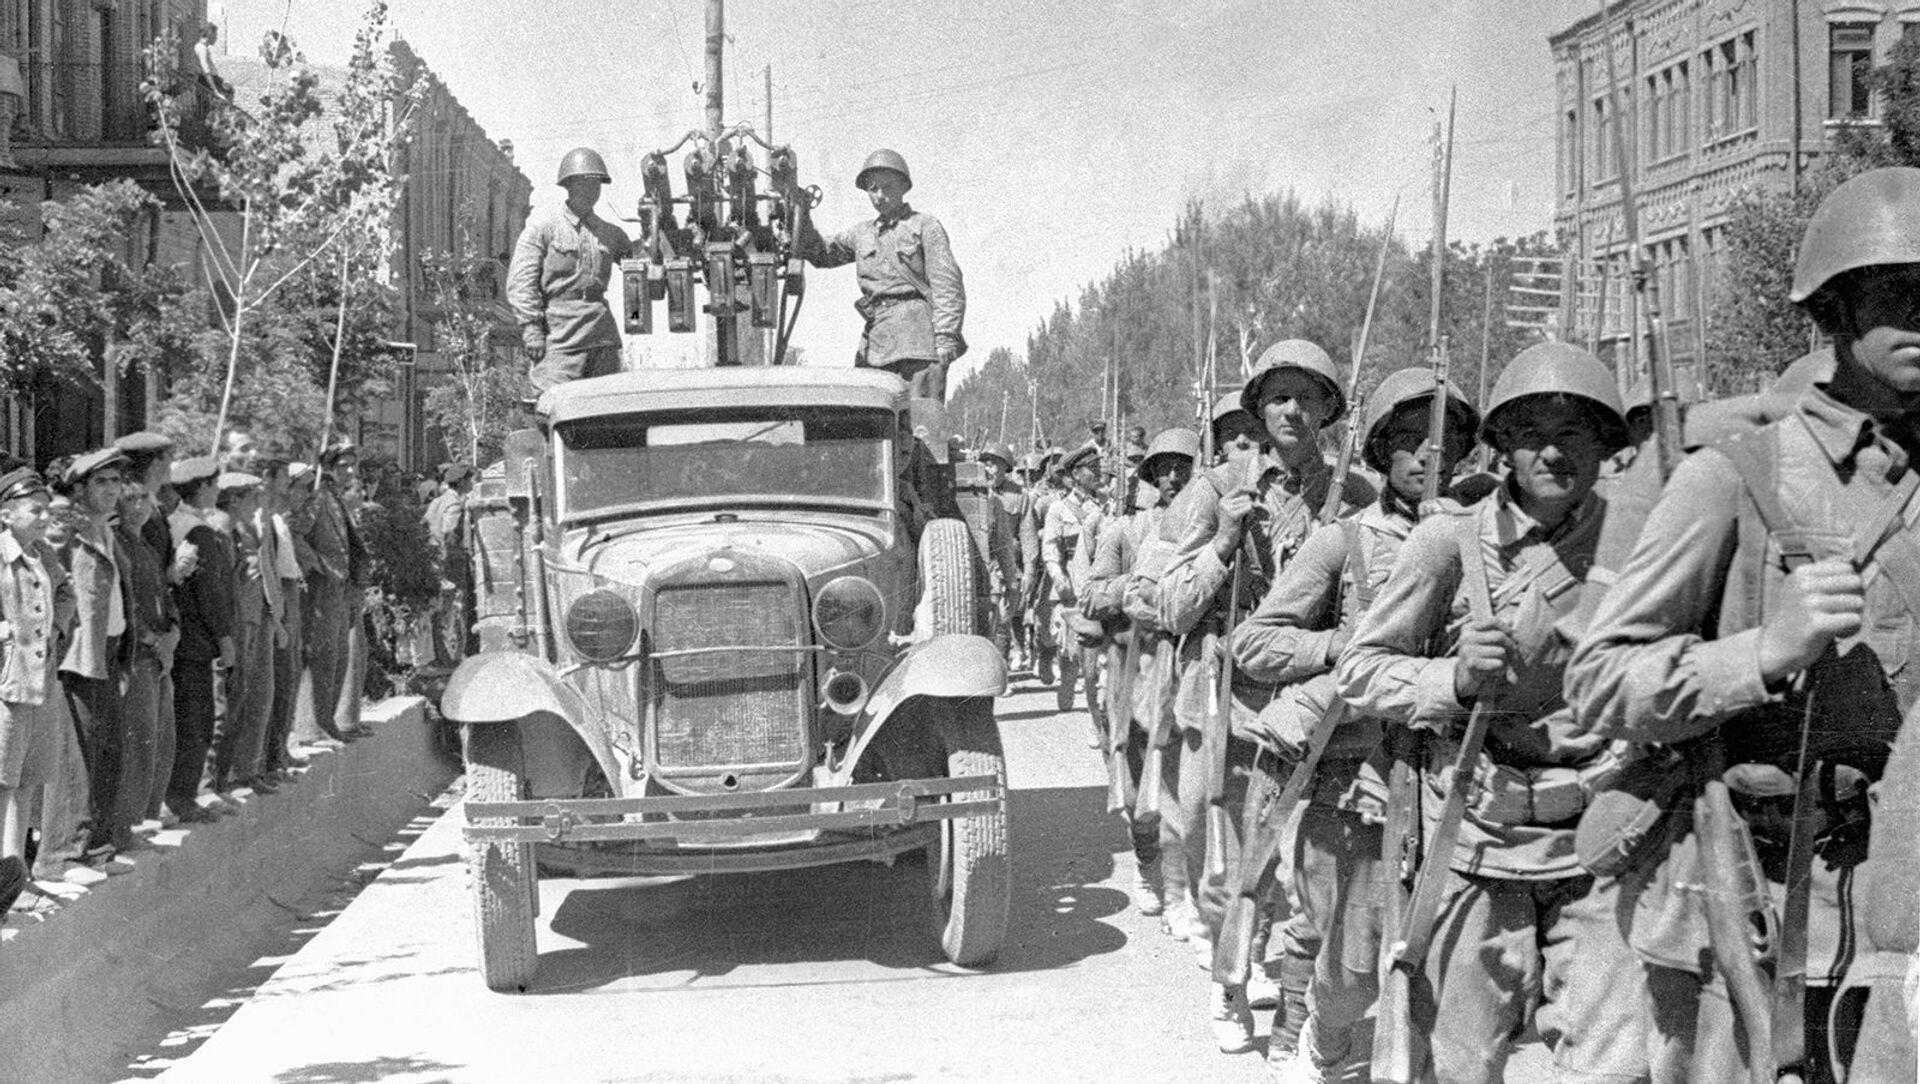 Советские войска вступают в город Тавриз, Иран (26 августа 1941) - Sputnik Արմենիա, 1920, 25.08.2021